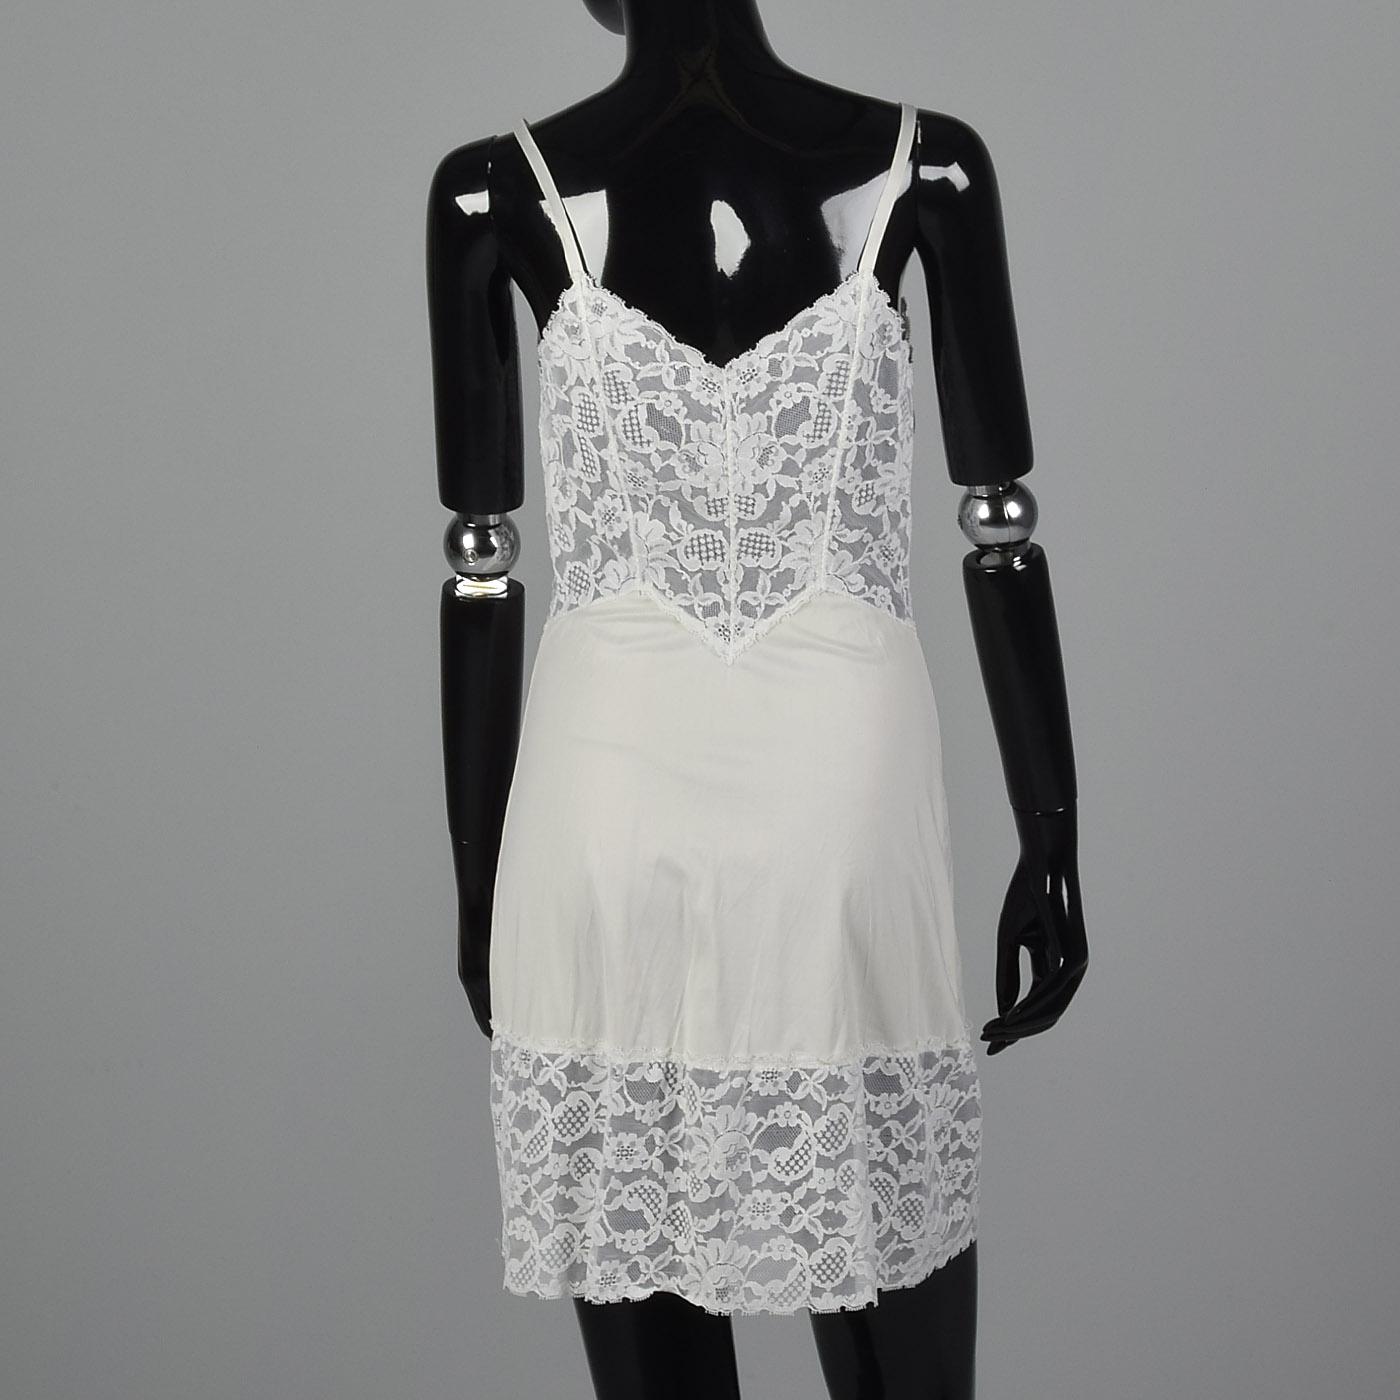 XXS 1960s White Nylon Slip Floral Lace Trim VTG 60s Adjustable Straps Lingerie Vintage Slips & Petticoats